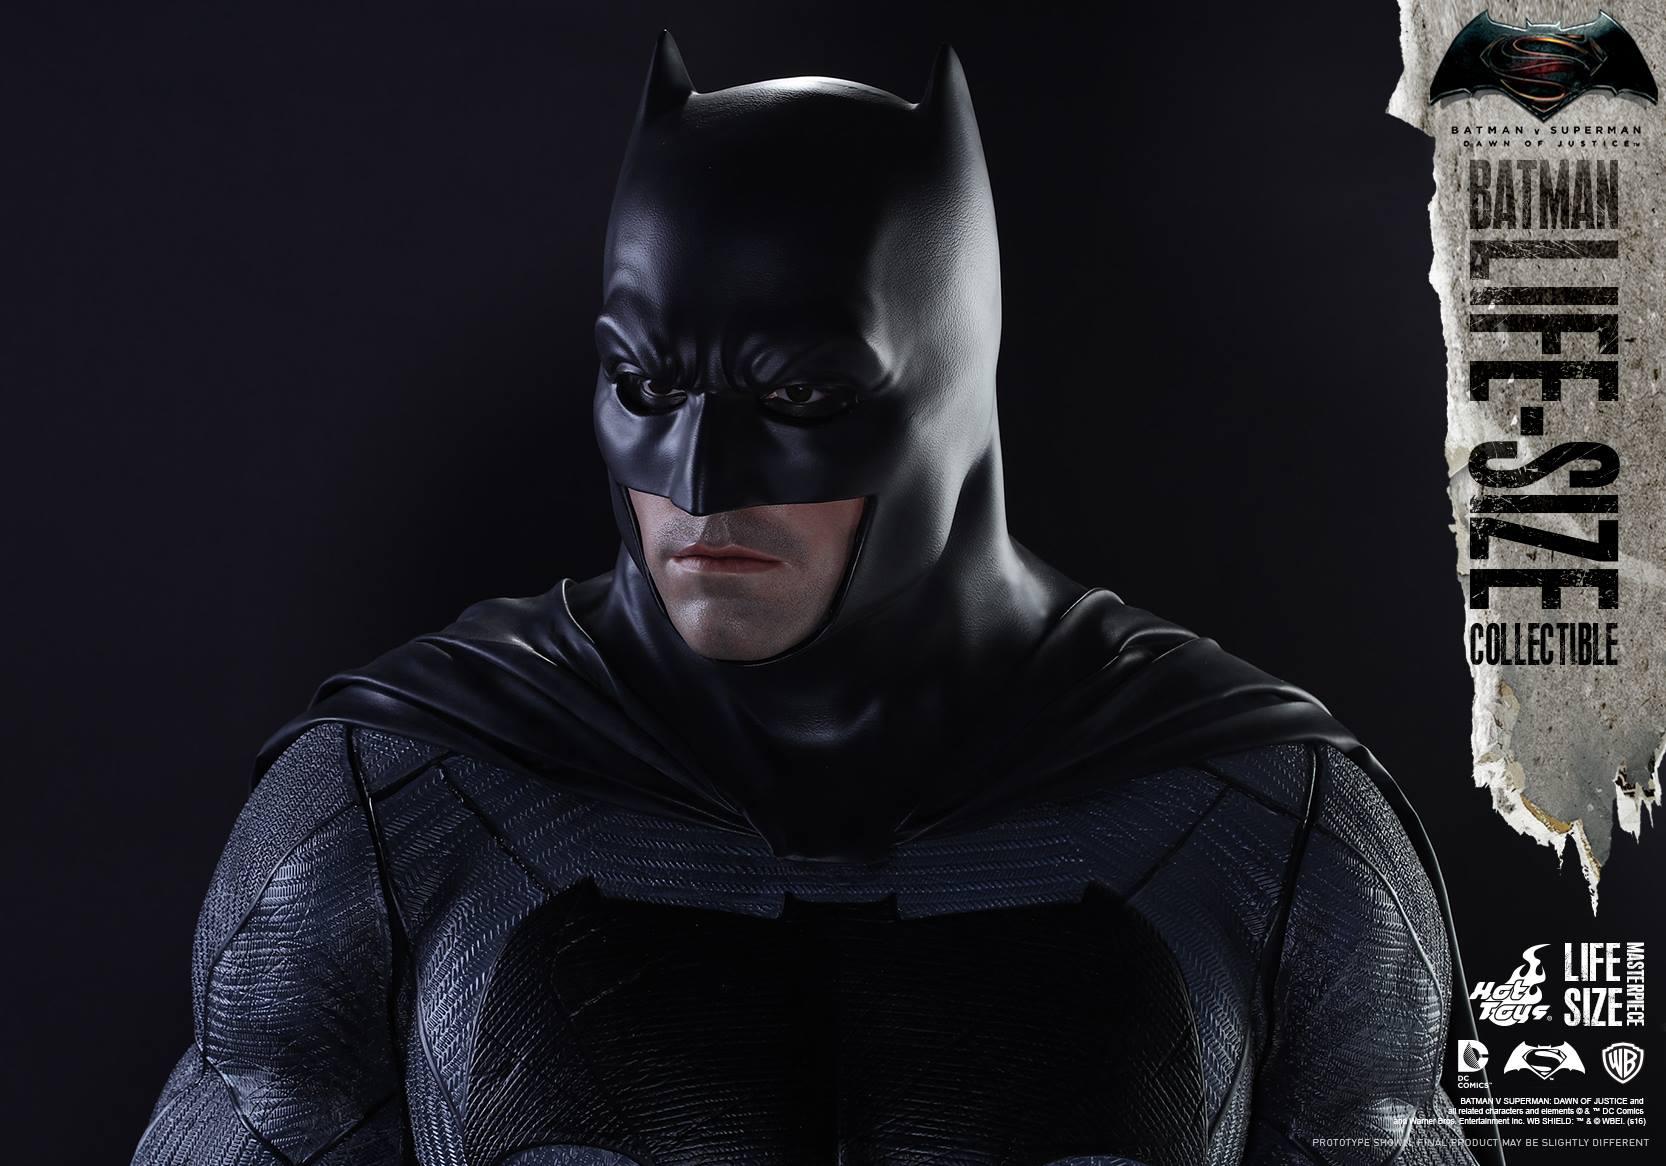 Hot Toys Batman v Superman Life-Size Statue